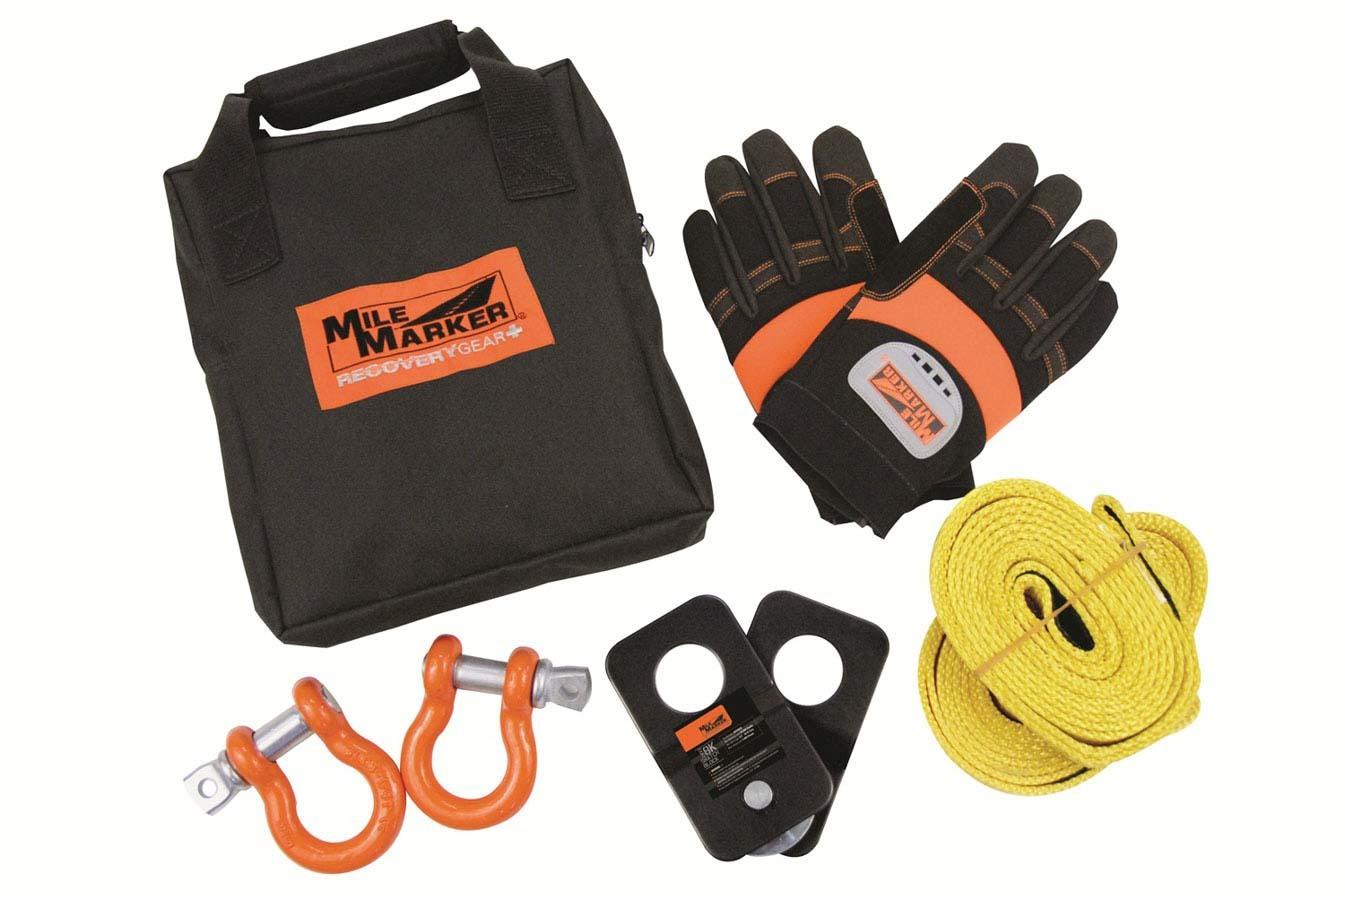 Mile Marker ATV/UTV Winch Accessory Kit